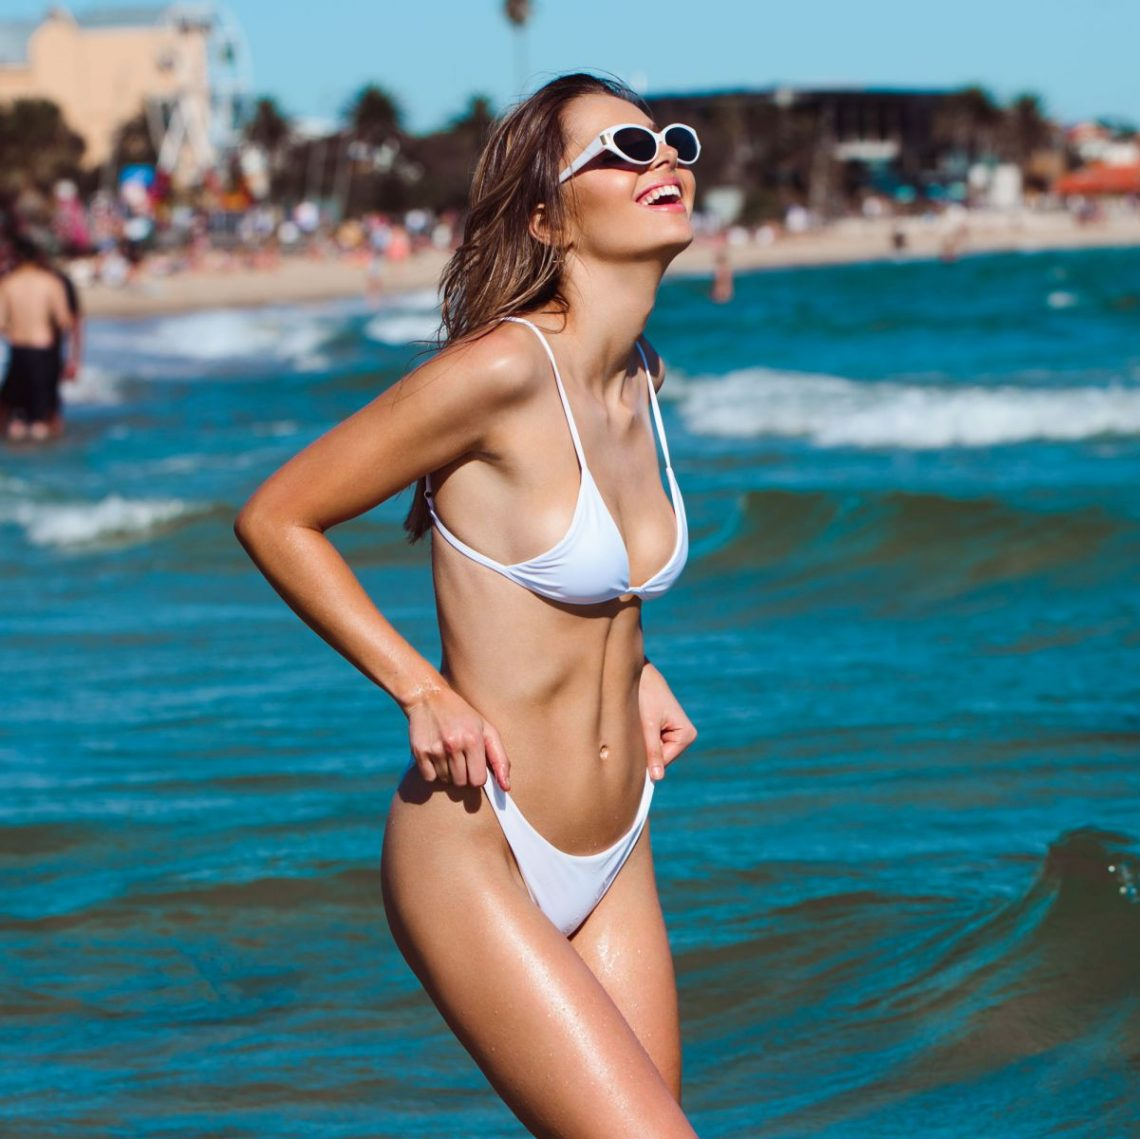 Balistarz-model-Pai-Cattapan-beach-shoot-bright-day-white-bikini